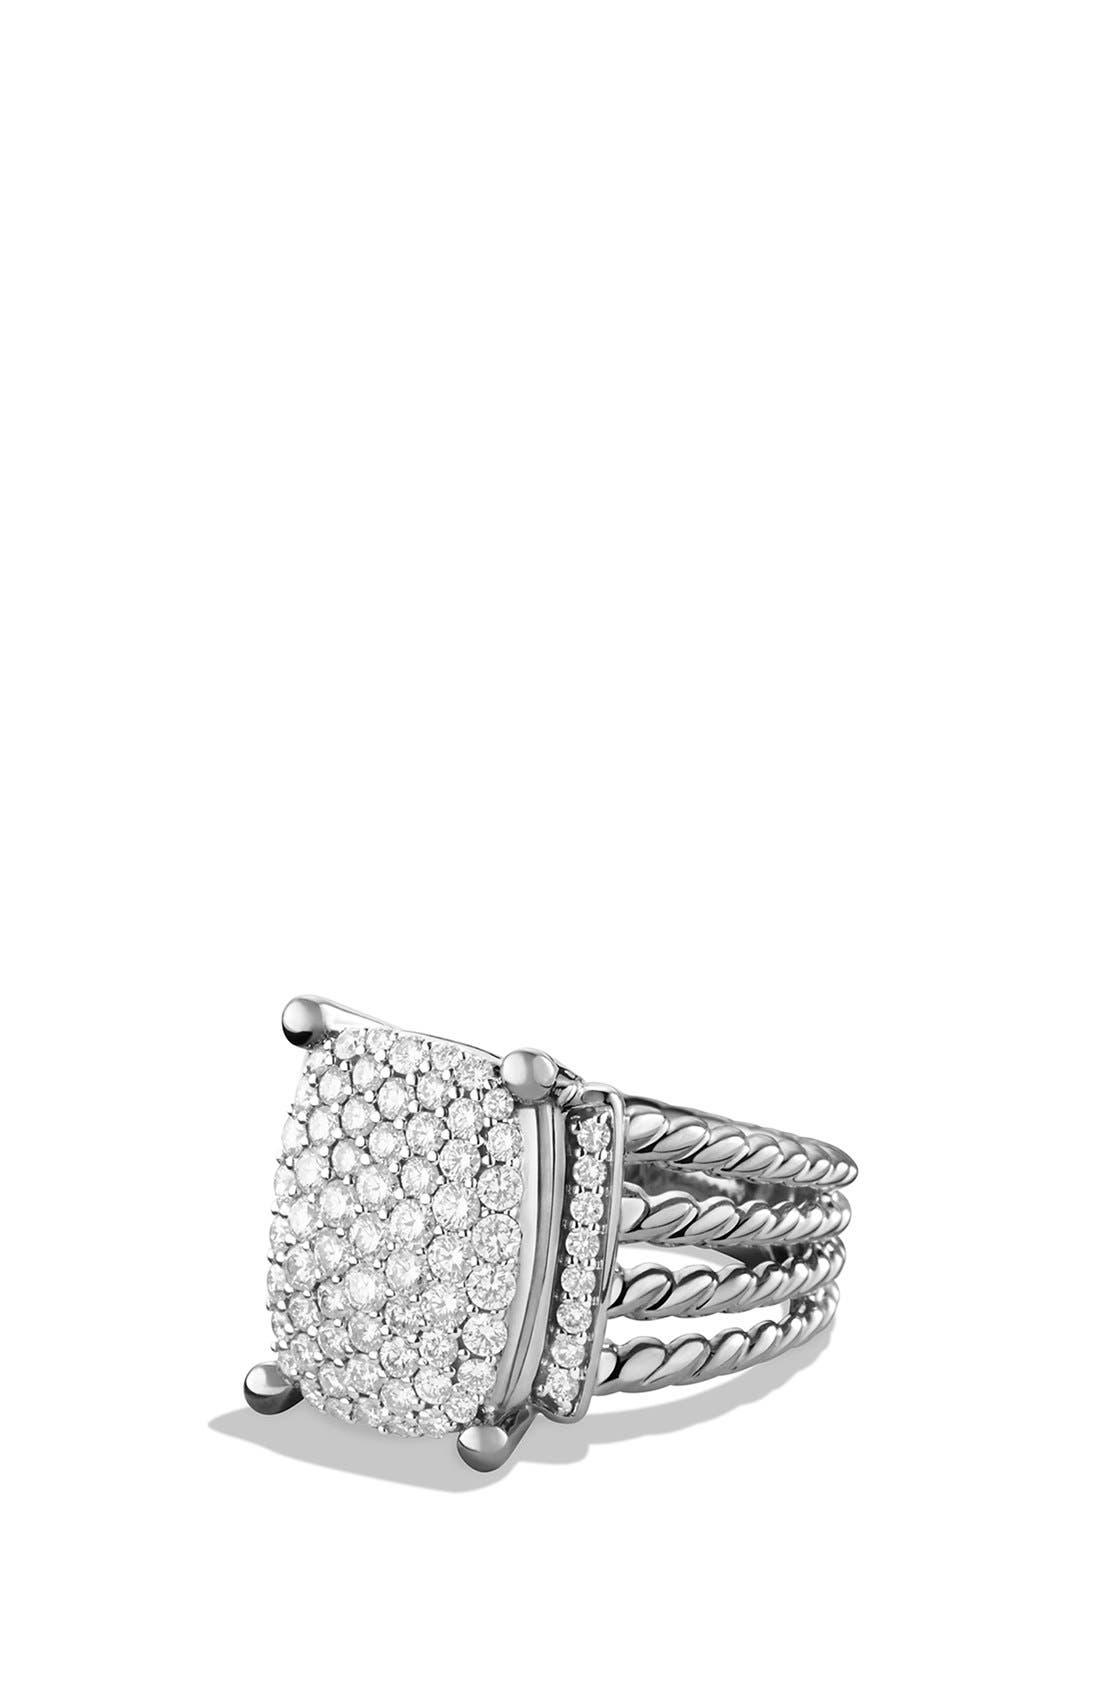 Main Image - David Yurman 'Wheaton' Ring with Diamonds